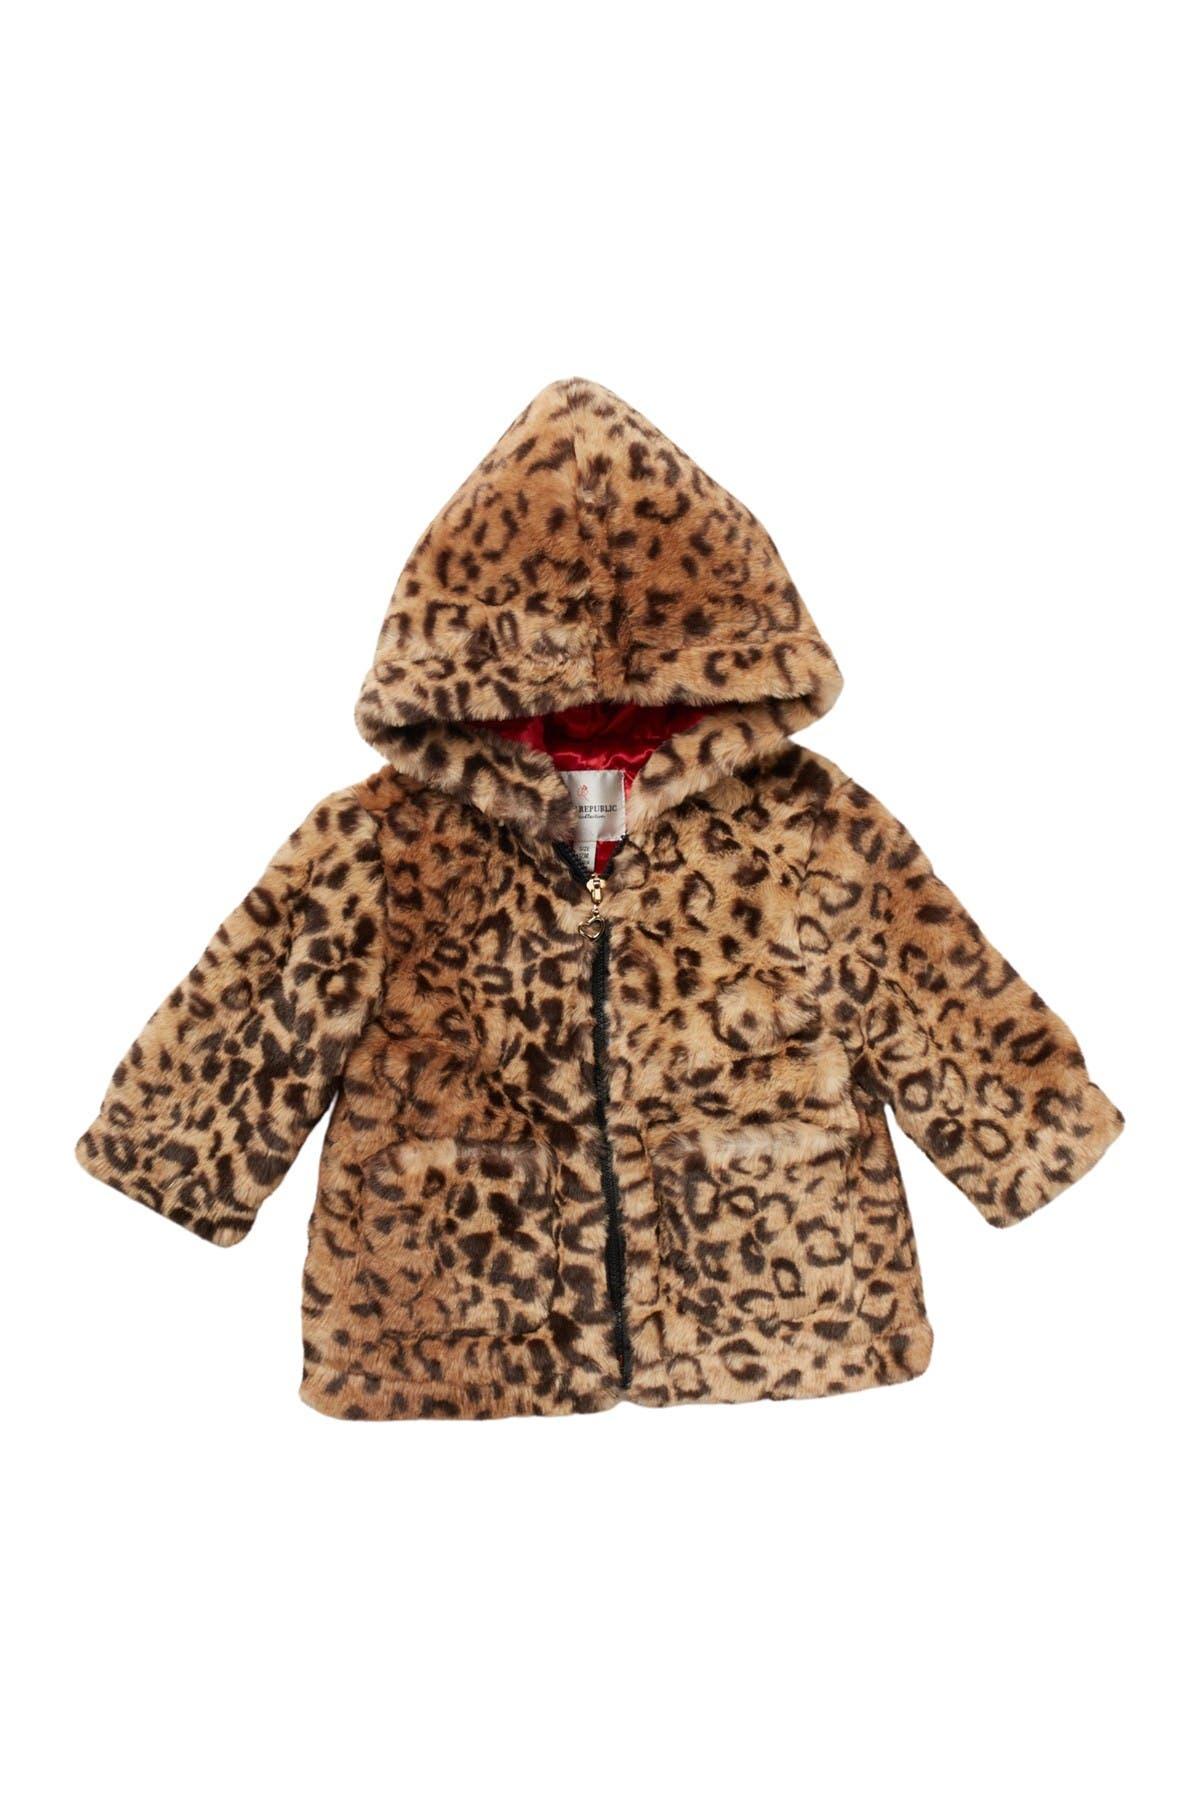 Image of Urban Republic Leopard Print Faux Fur Hoodie